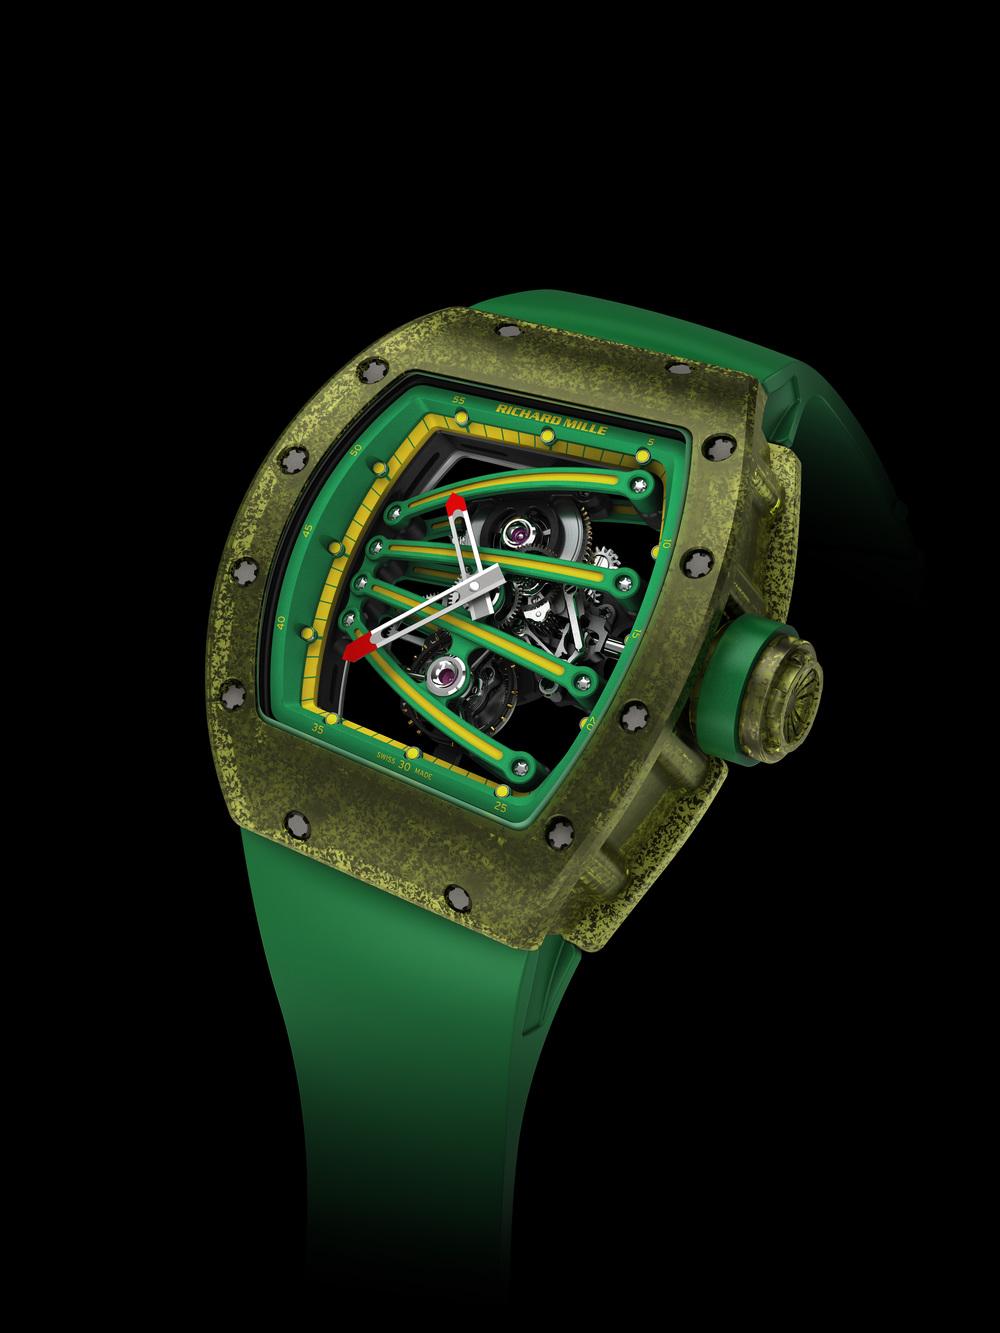 The Richard Mille RM 59-01 Tourbillon Yohan Blake